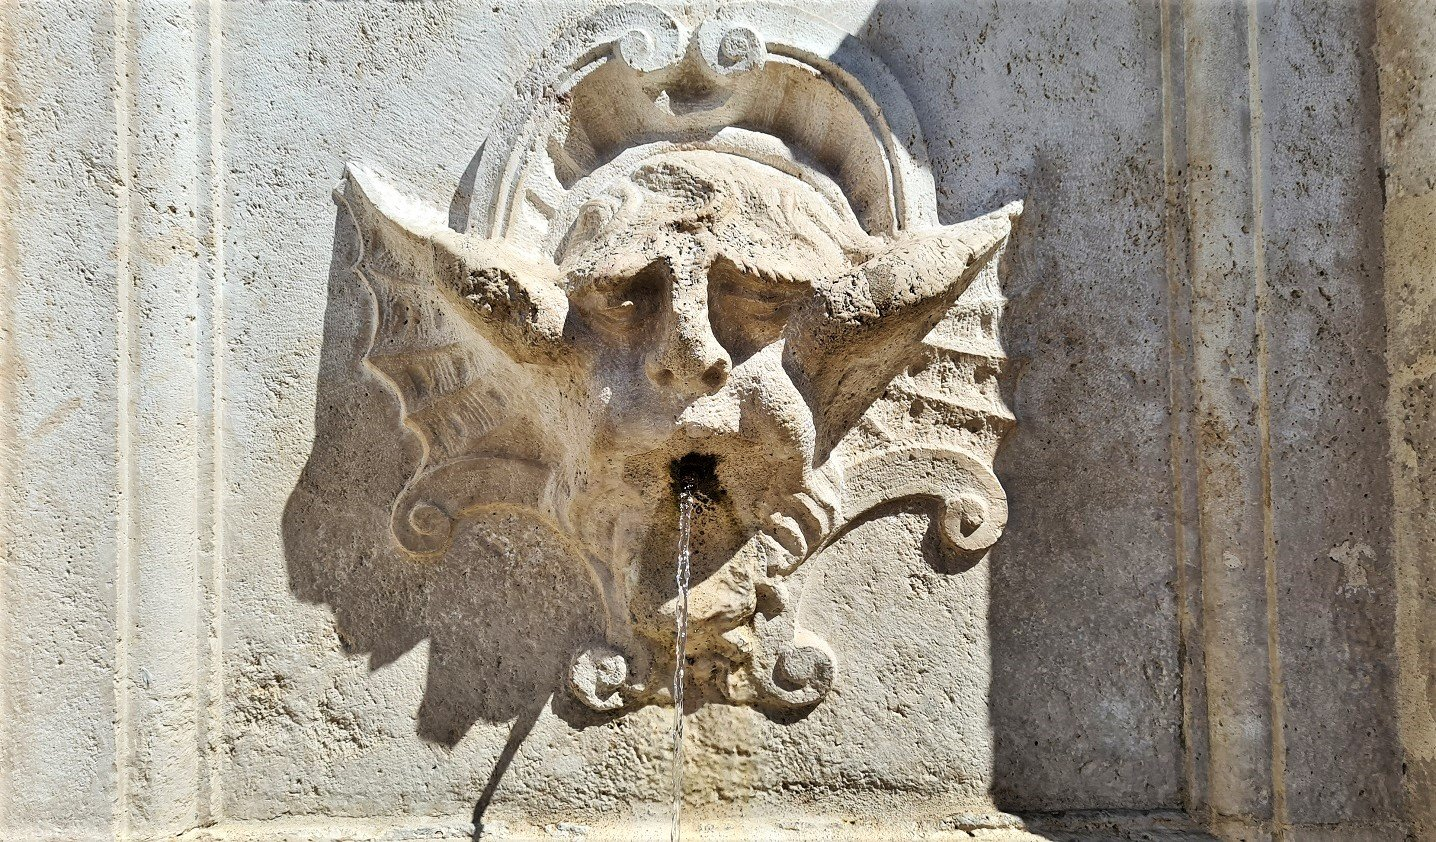 Fontana Fauno Spoleto